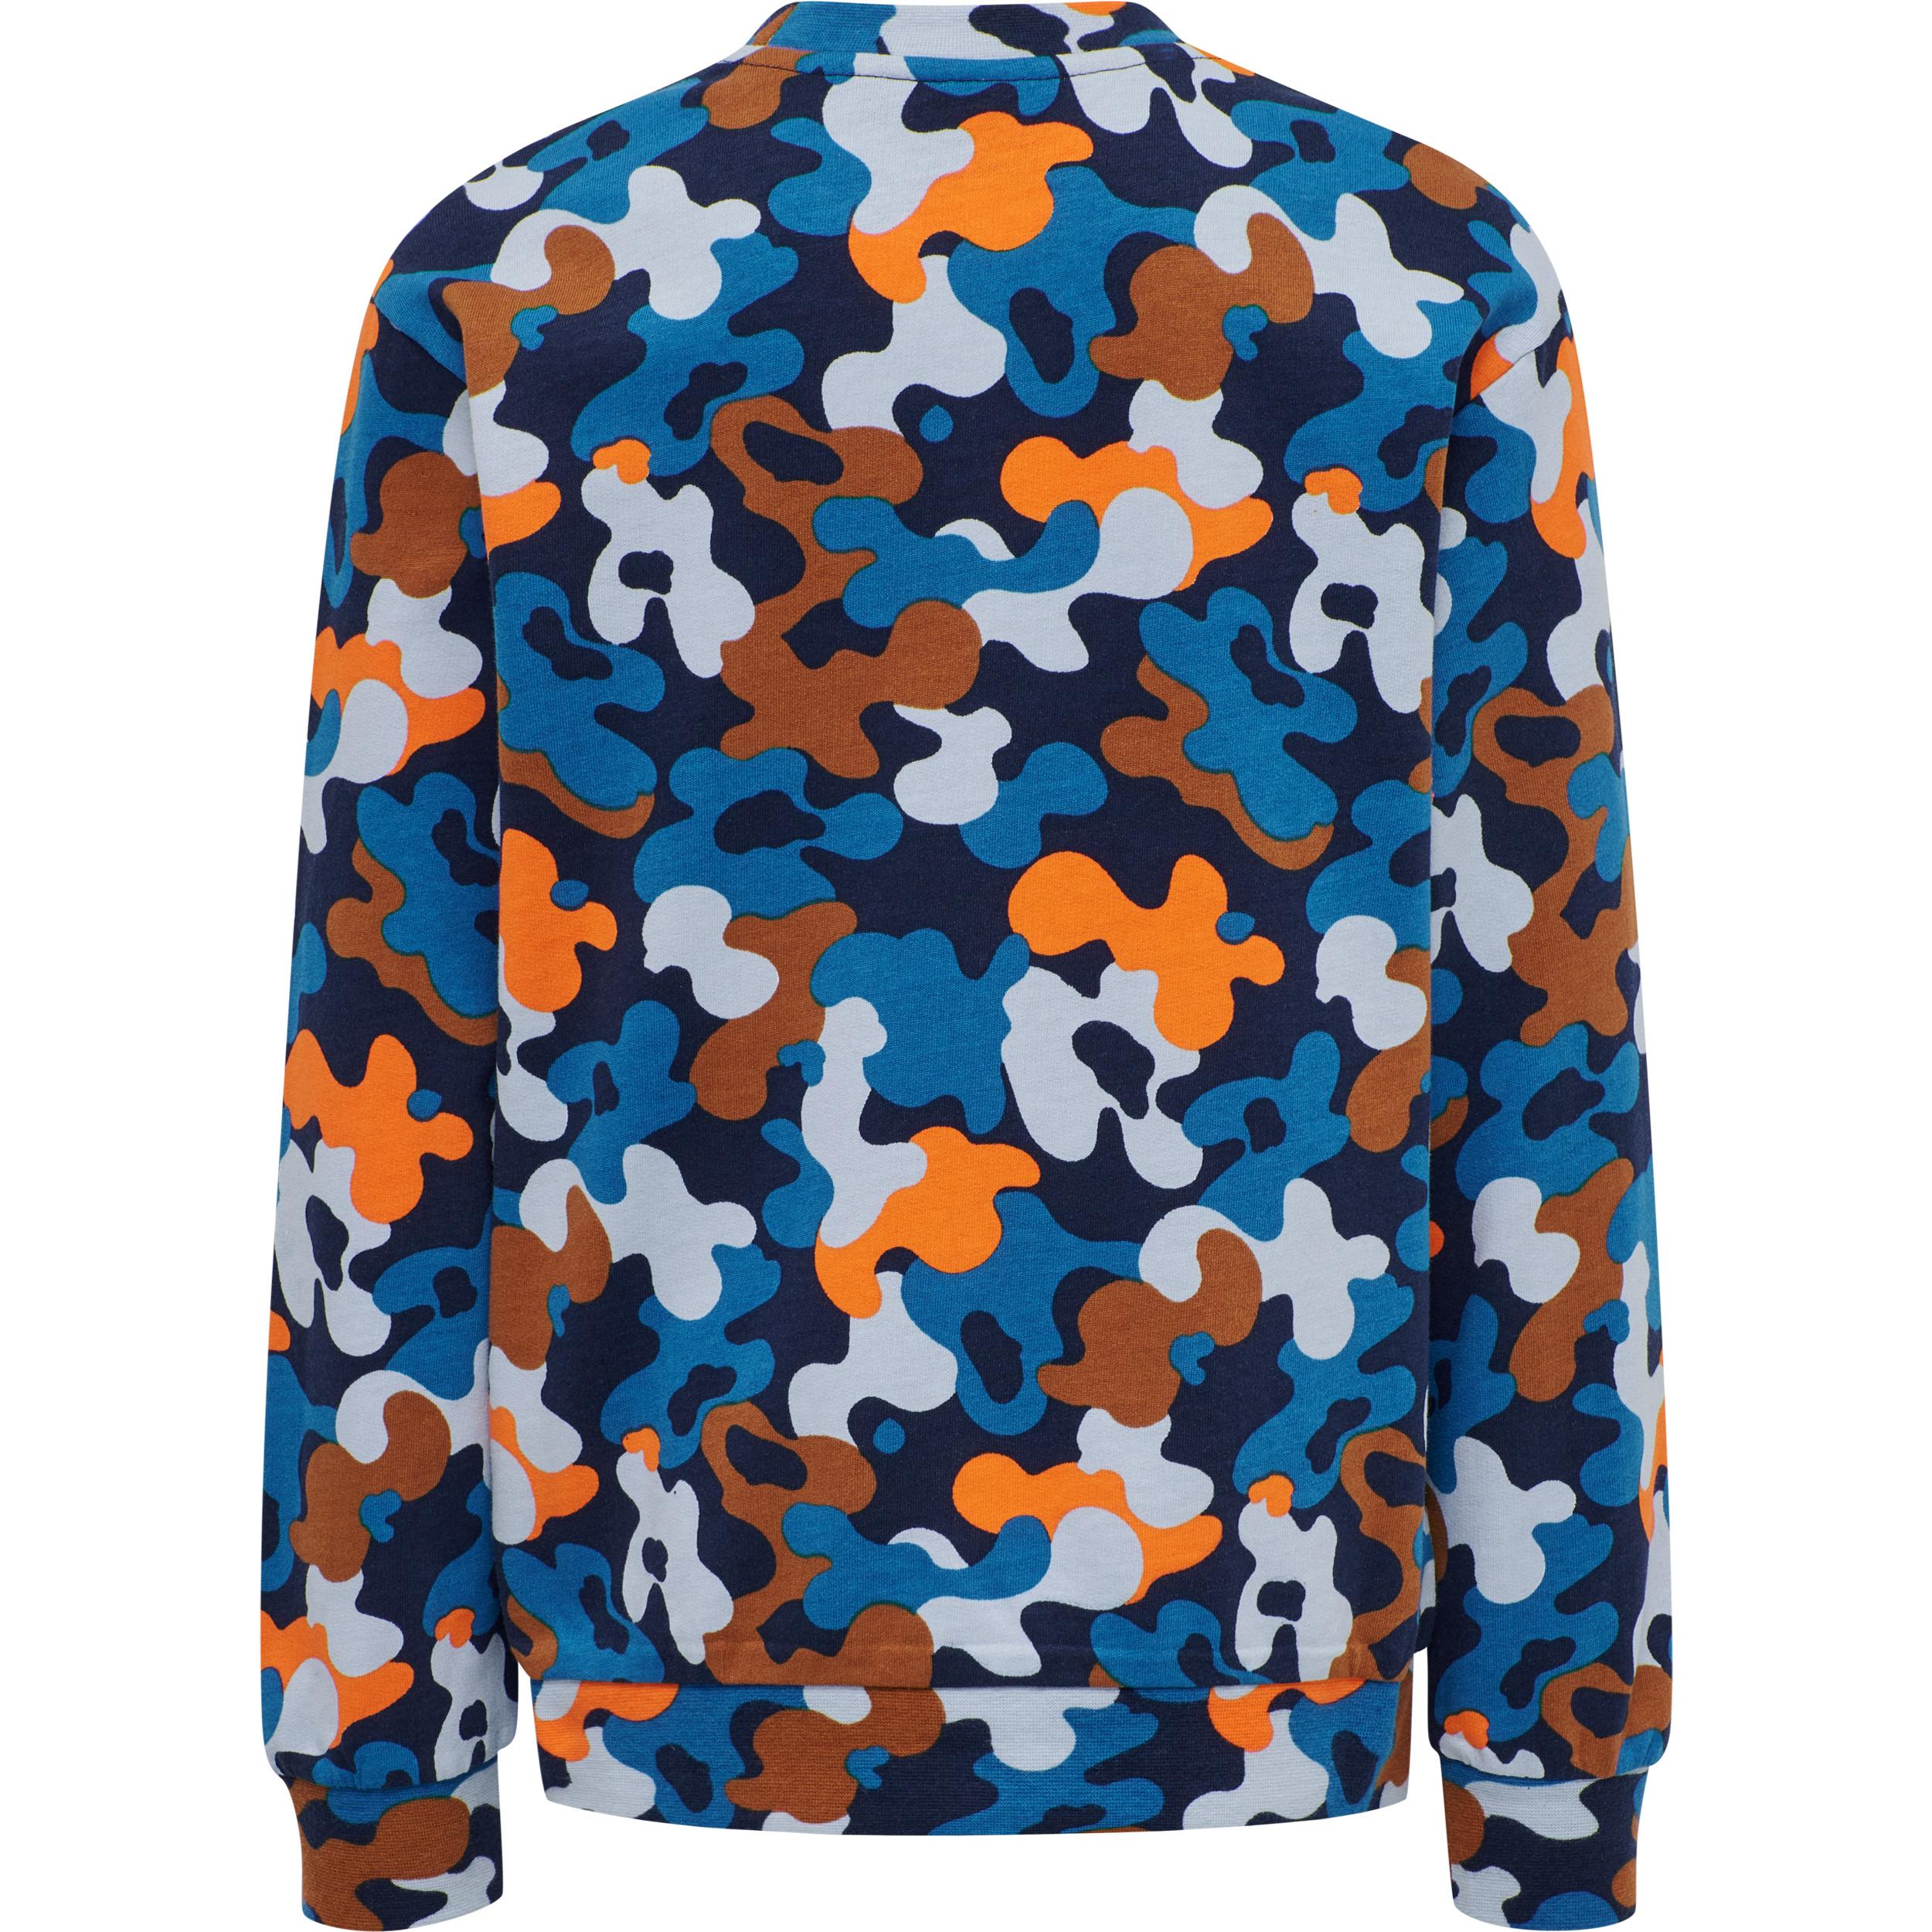 Hummel Hmlace sweatshirt, black iris, 140